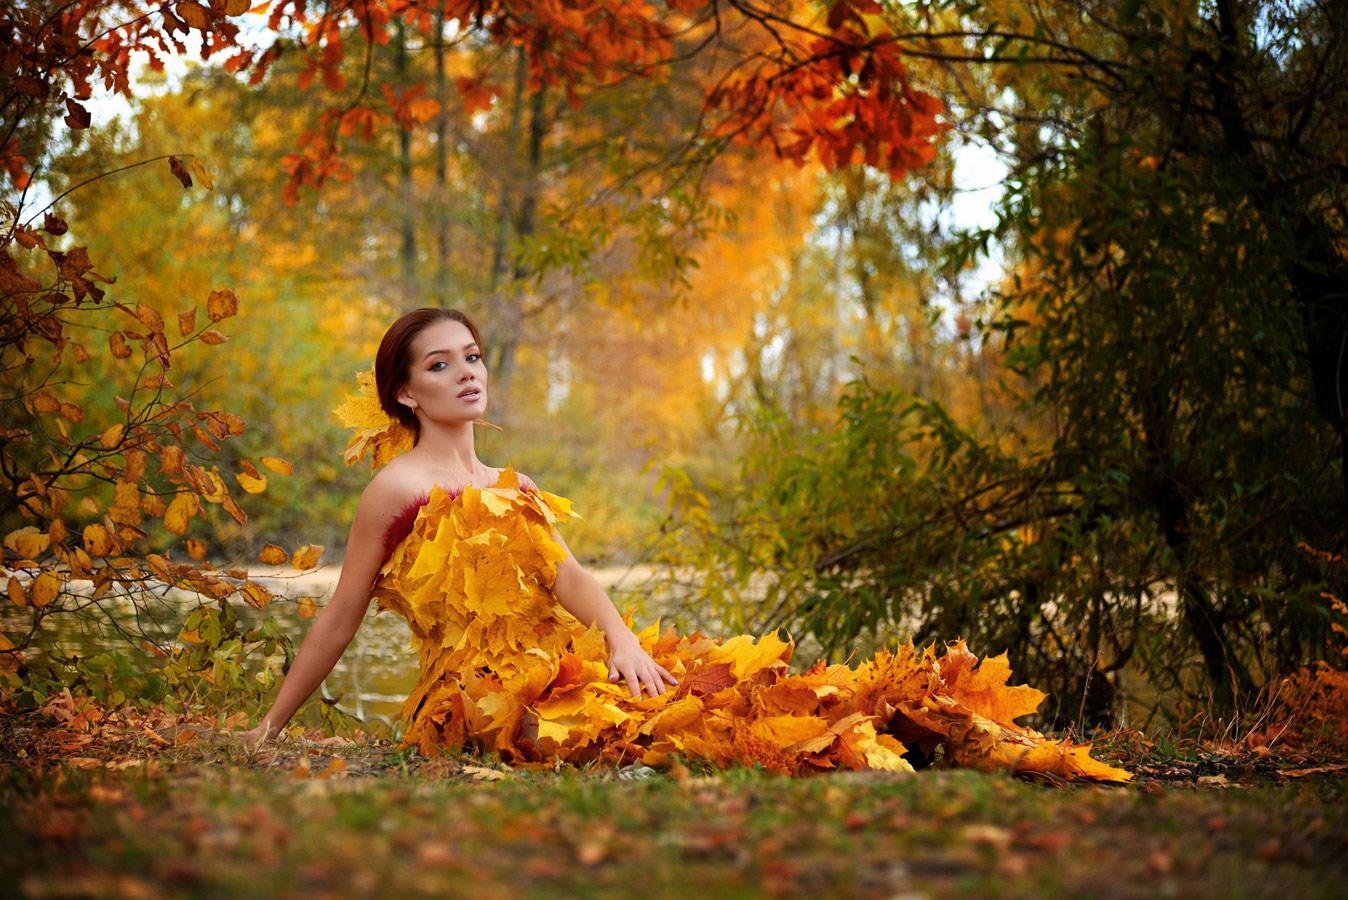 Октябрь, © Оксана Астрова, Фотоконкурс «Осенний портрет»